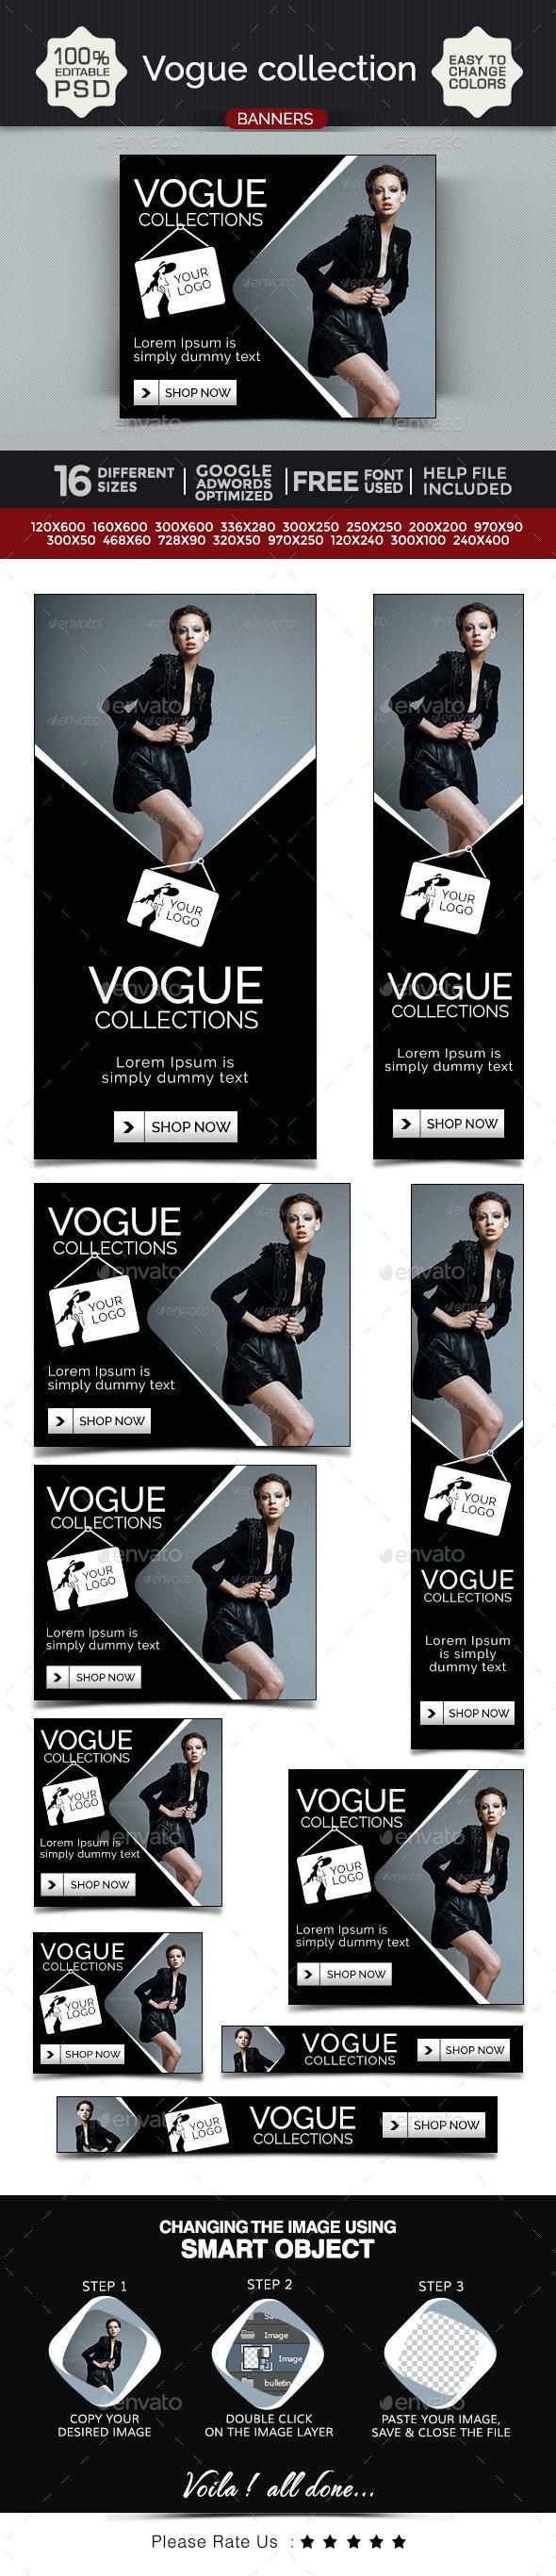 Vogue Collection Banner Design Set - Banners & Ads Web Elements